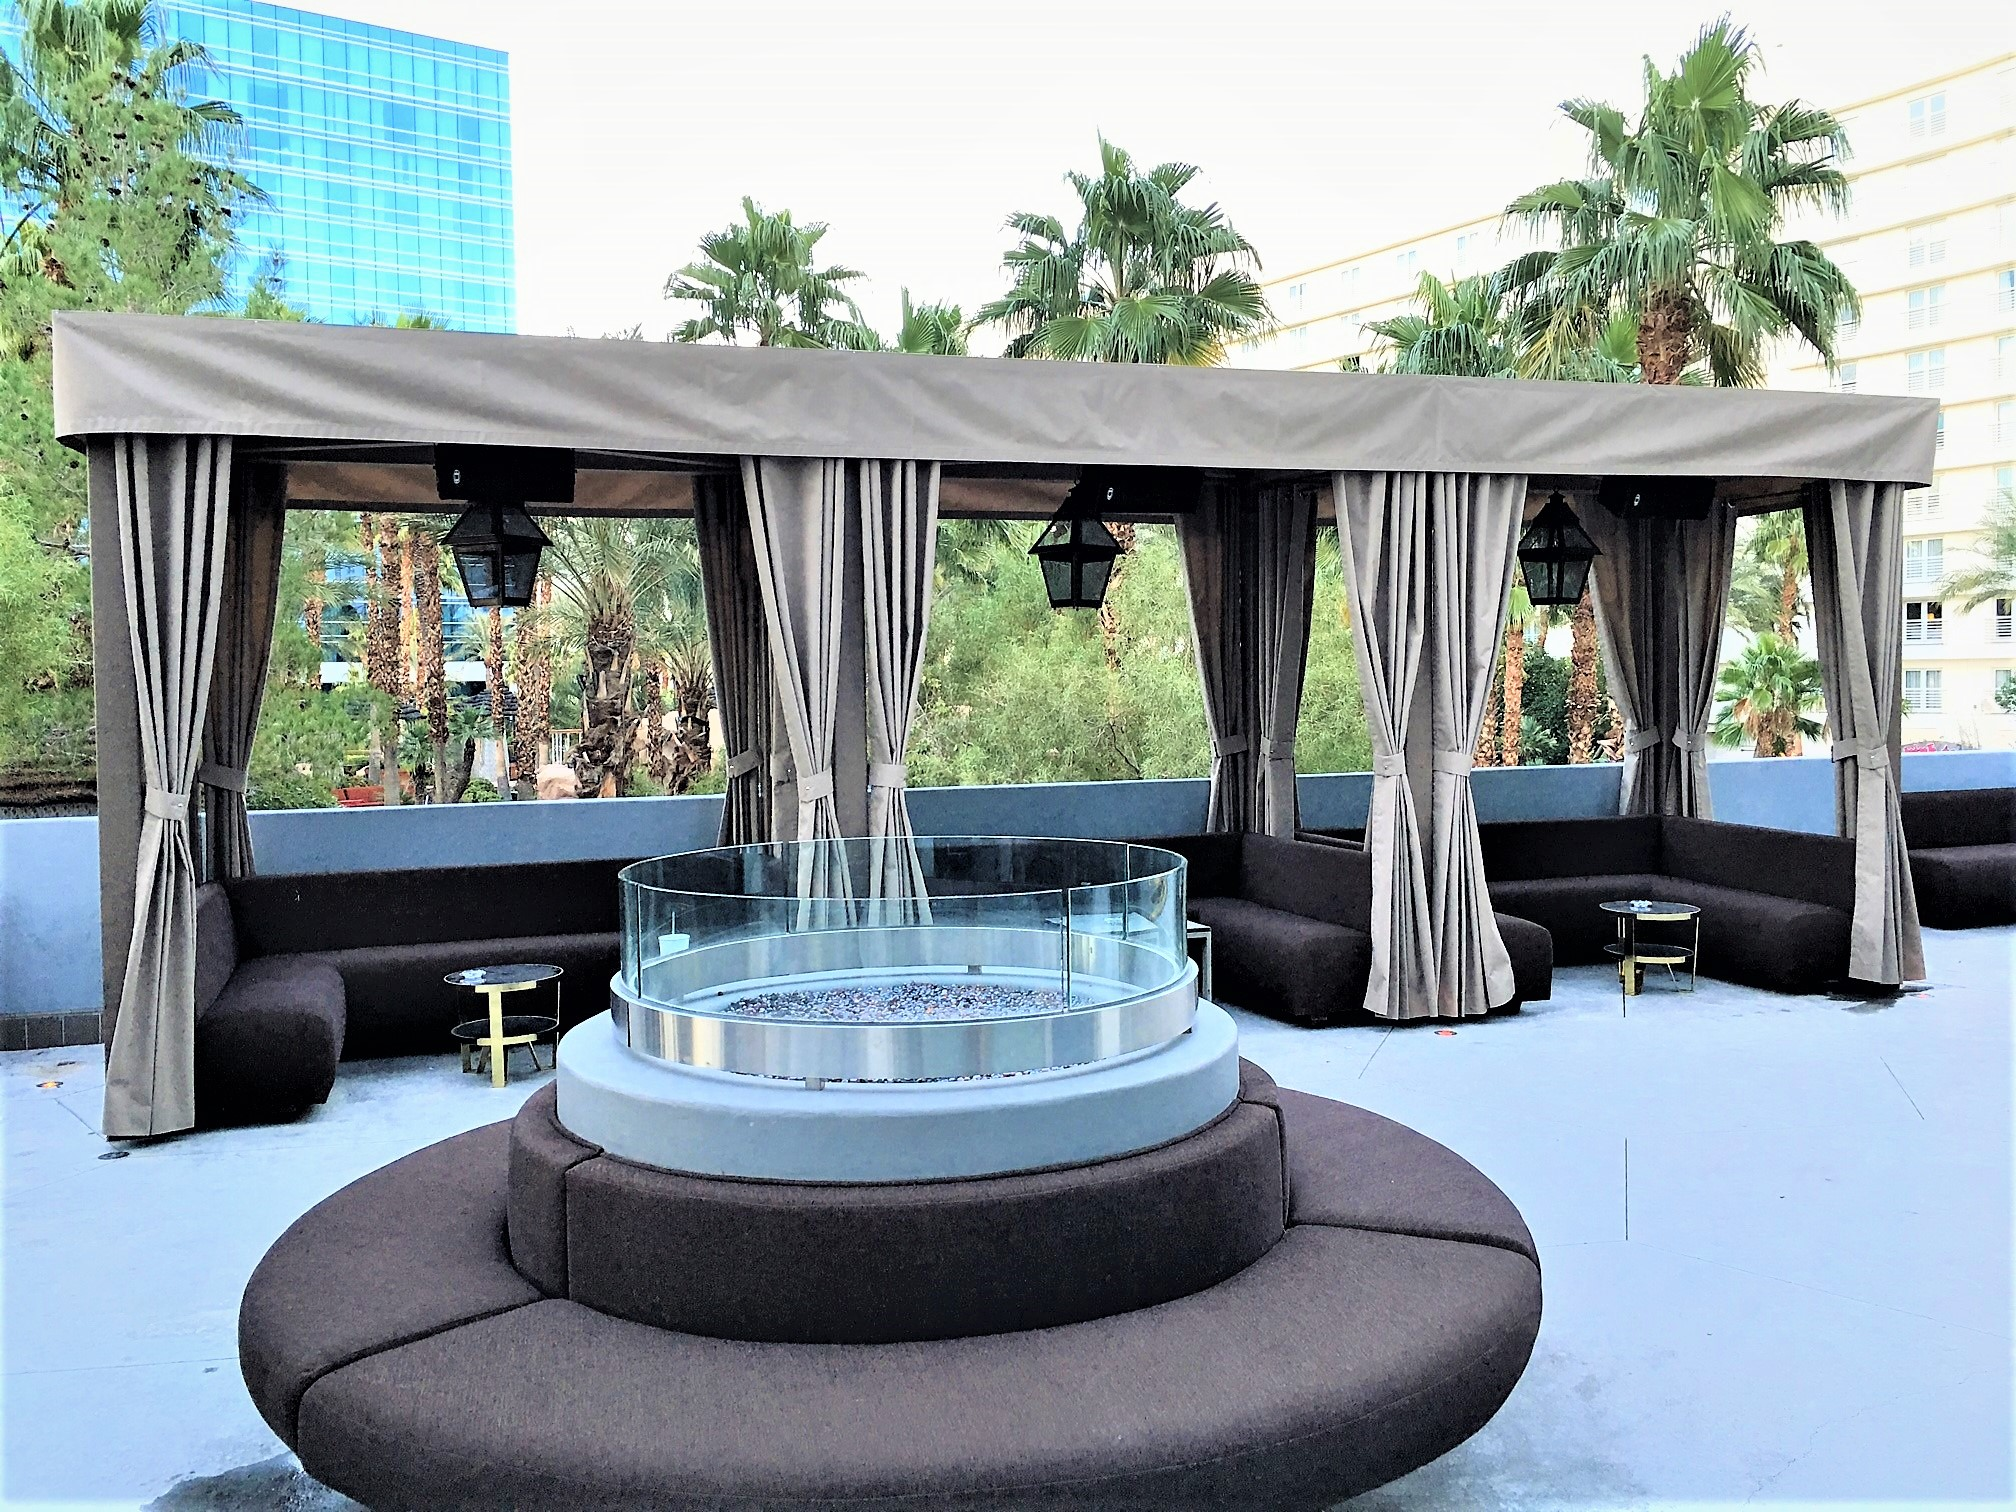 Vanity Terrace @ Hard Rock Hotel, Las Vegas